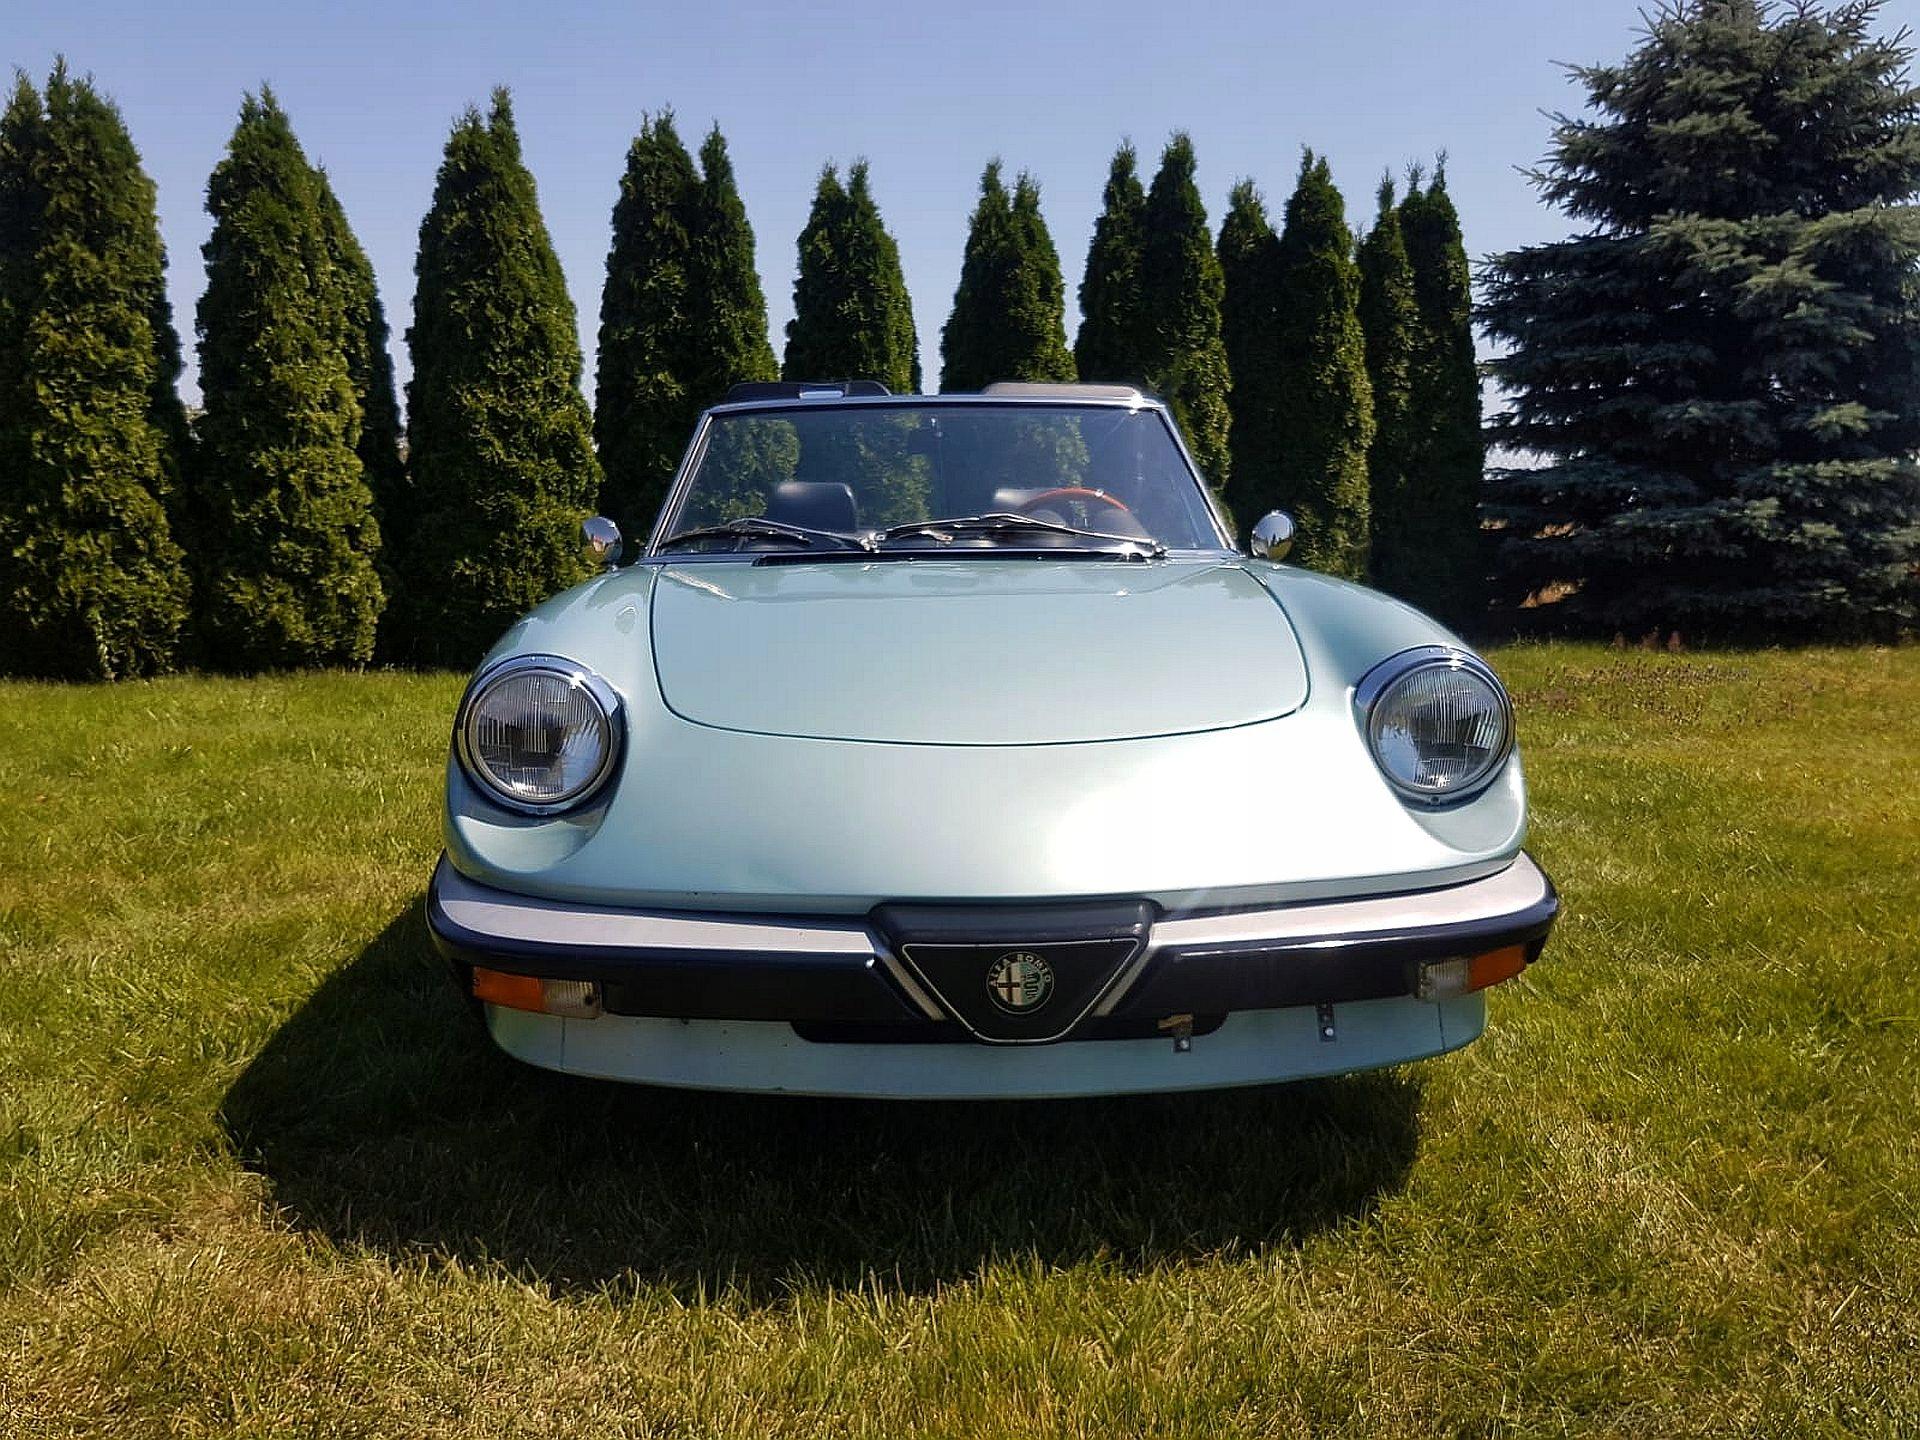 Alfa Romeo Spider 1.6 europa, kolekcjonerska